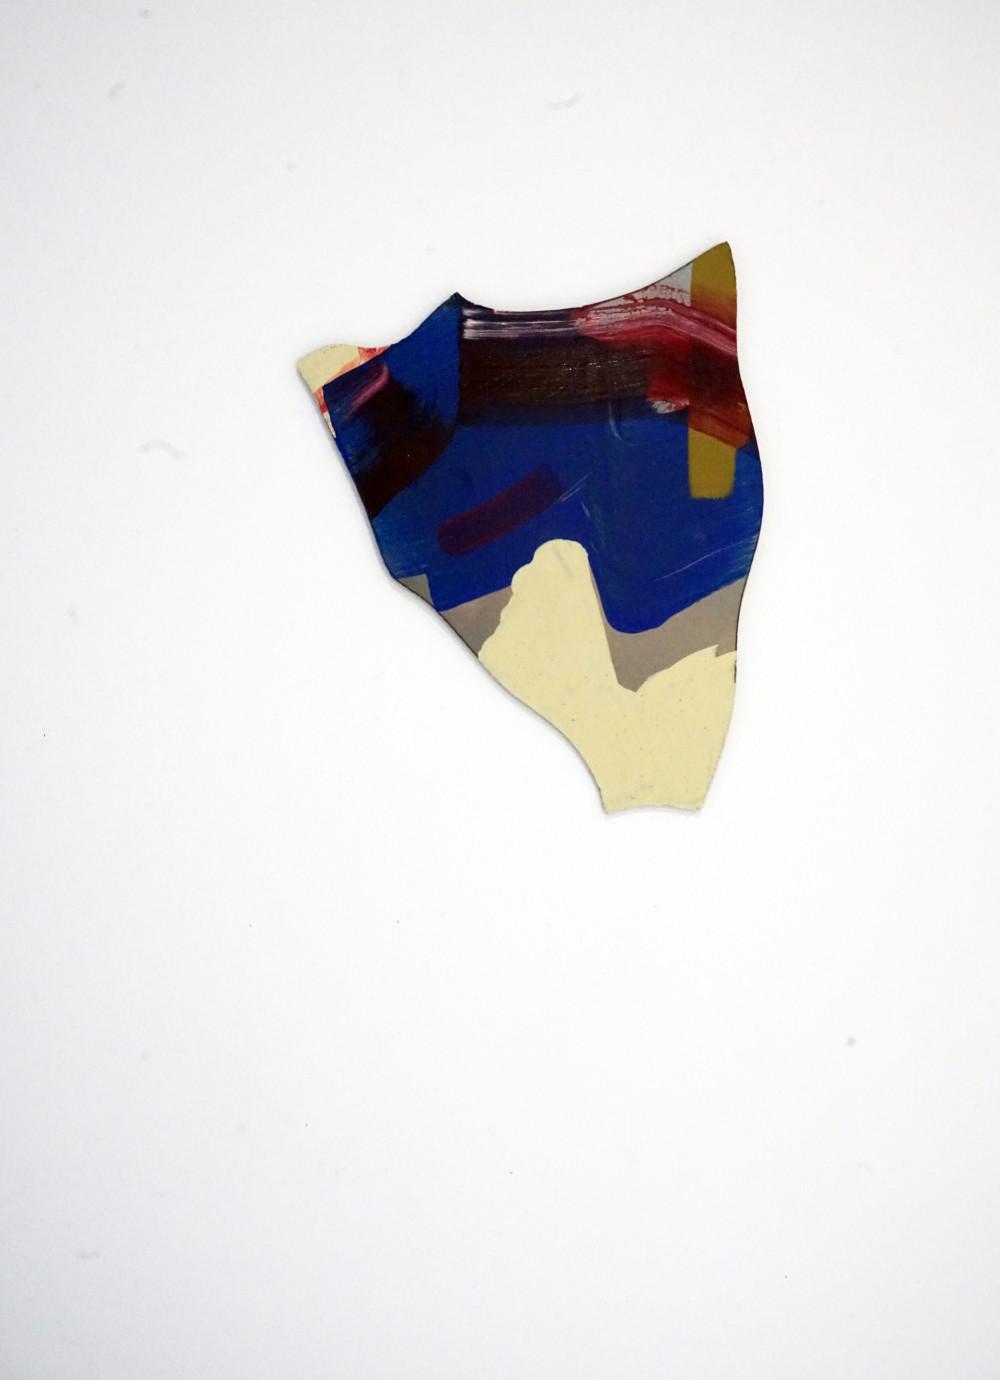 Pao-Leng Kung, Pattern overlay y, Acrylic on mild steel